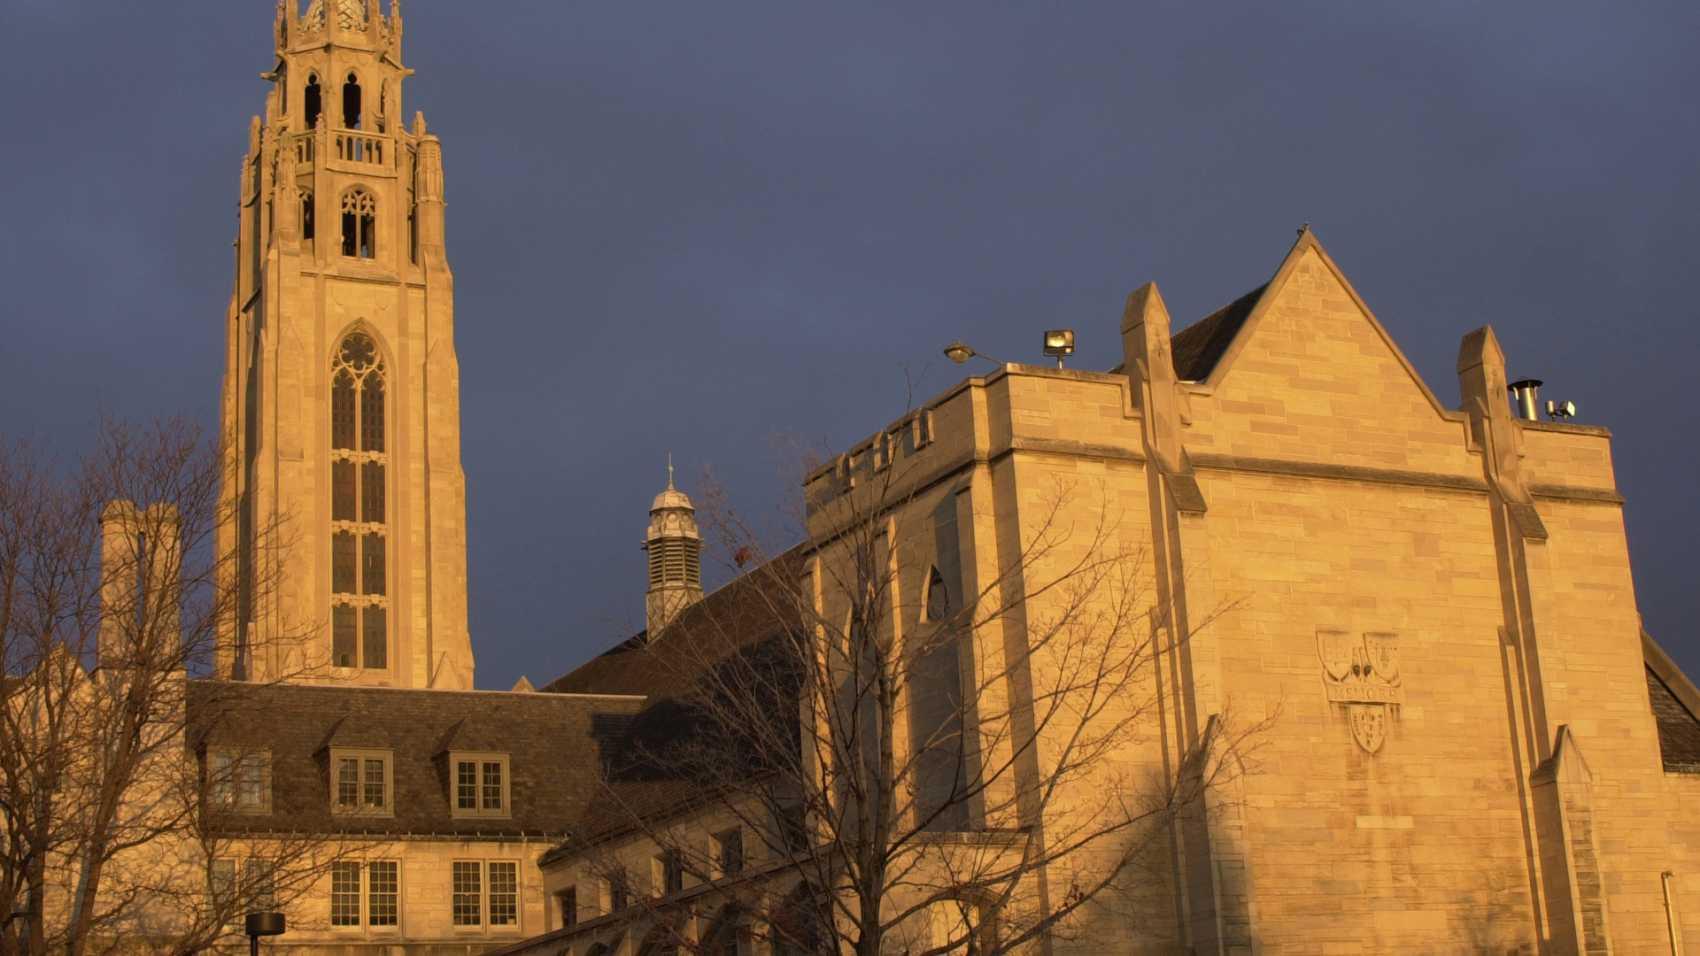 gallery of the university - photo #15